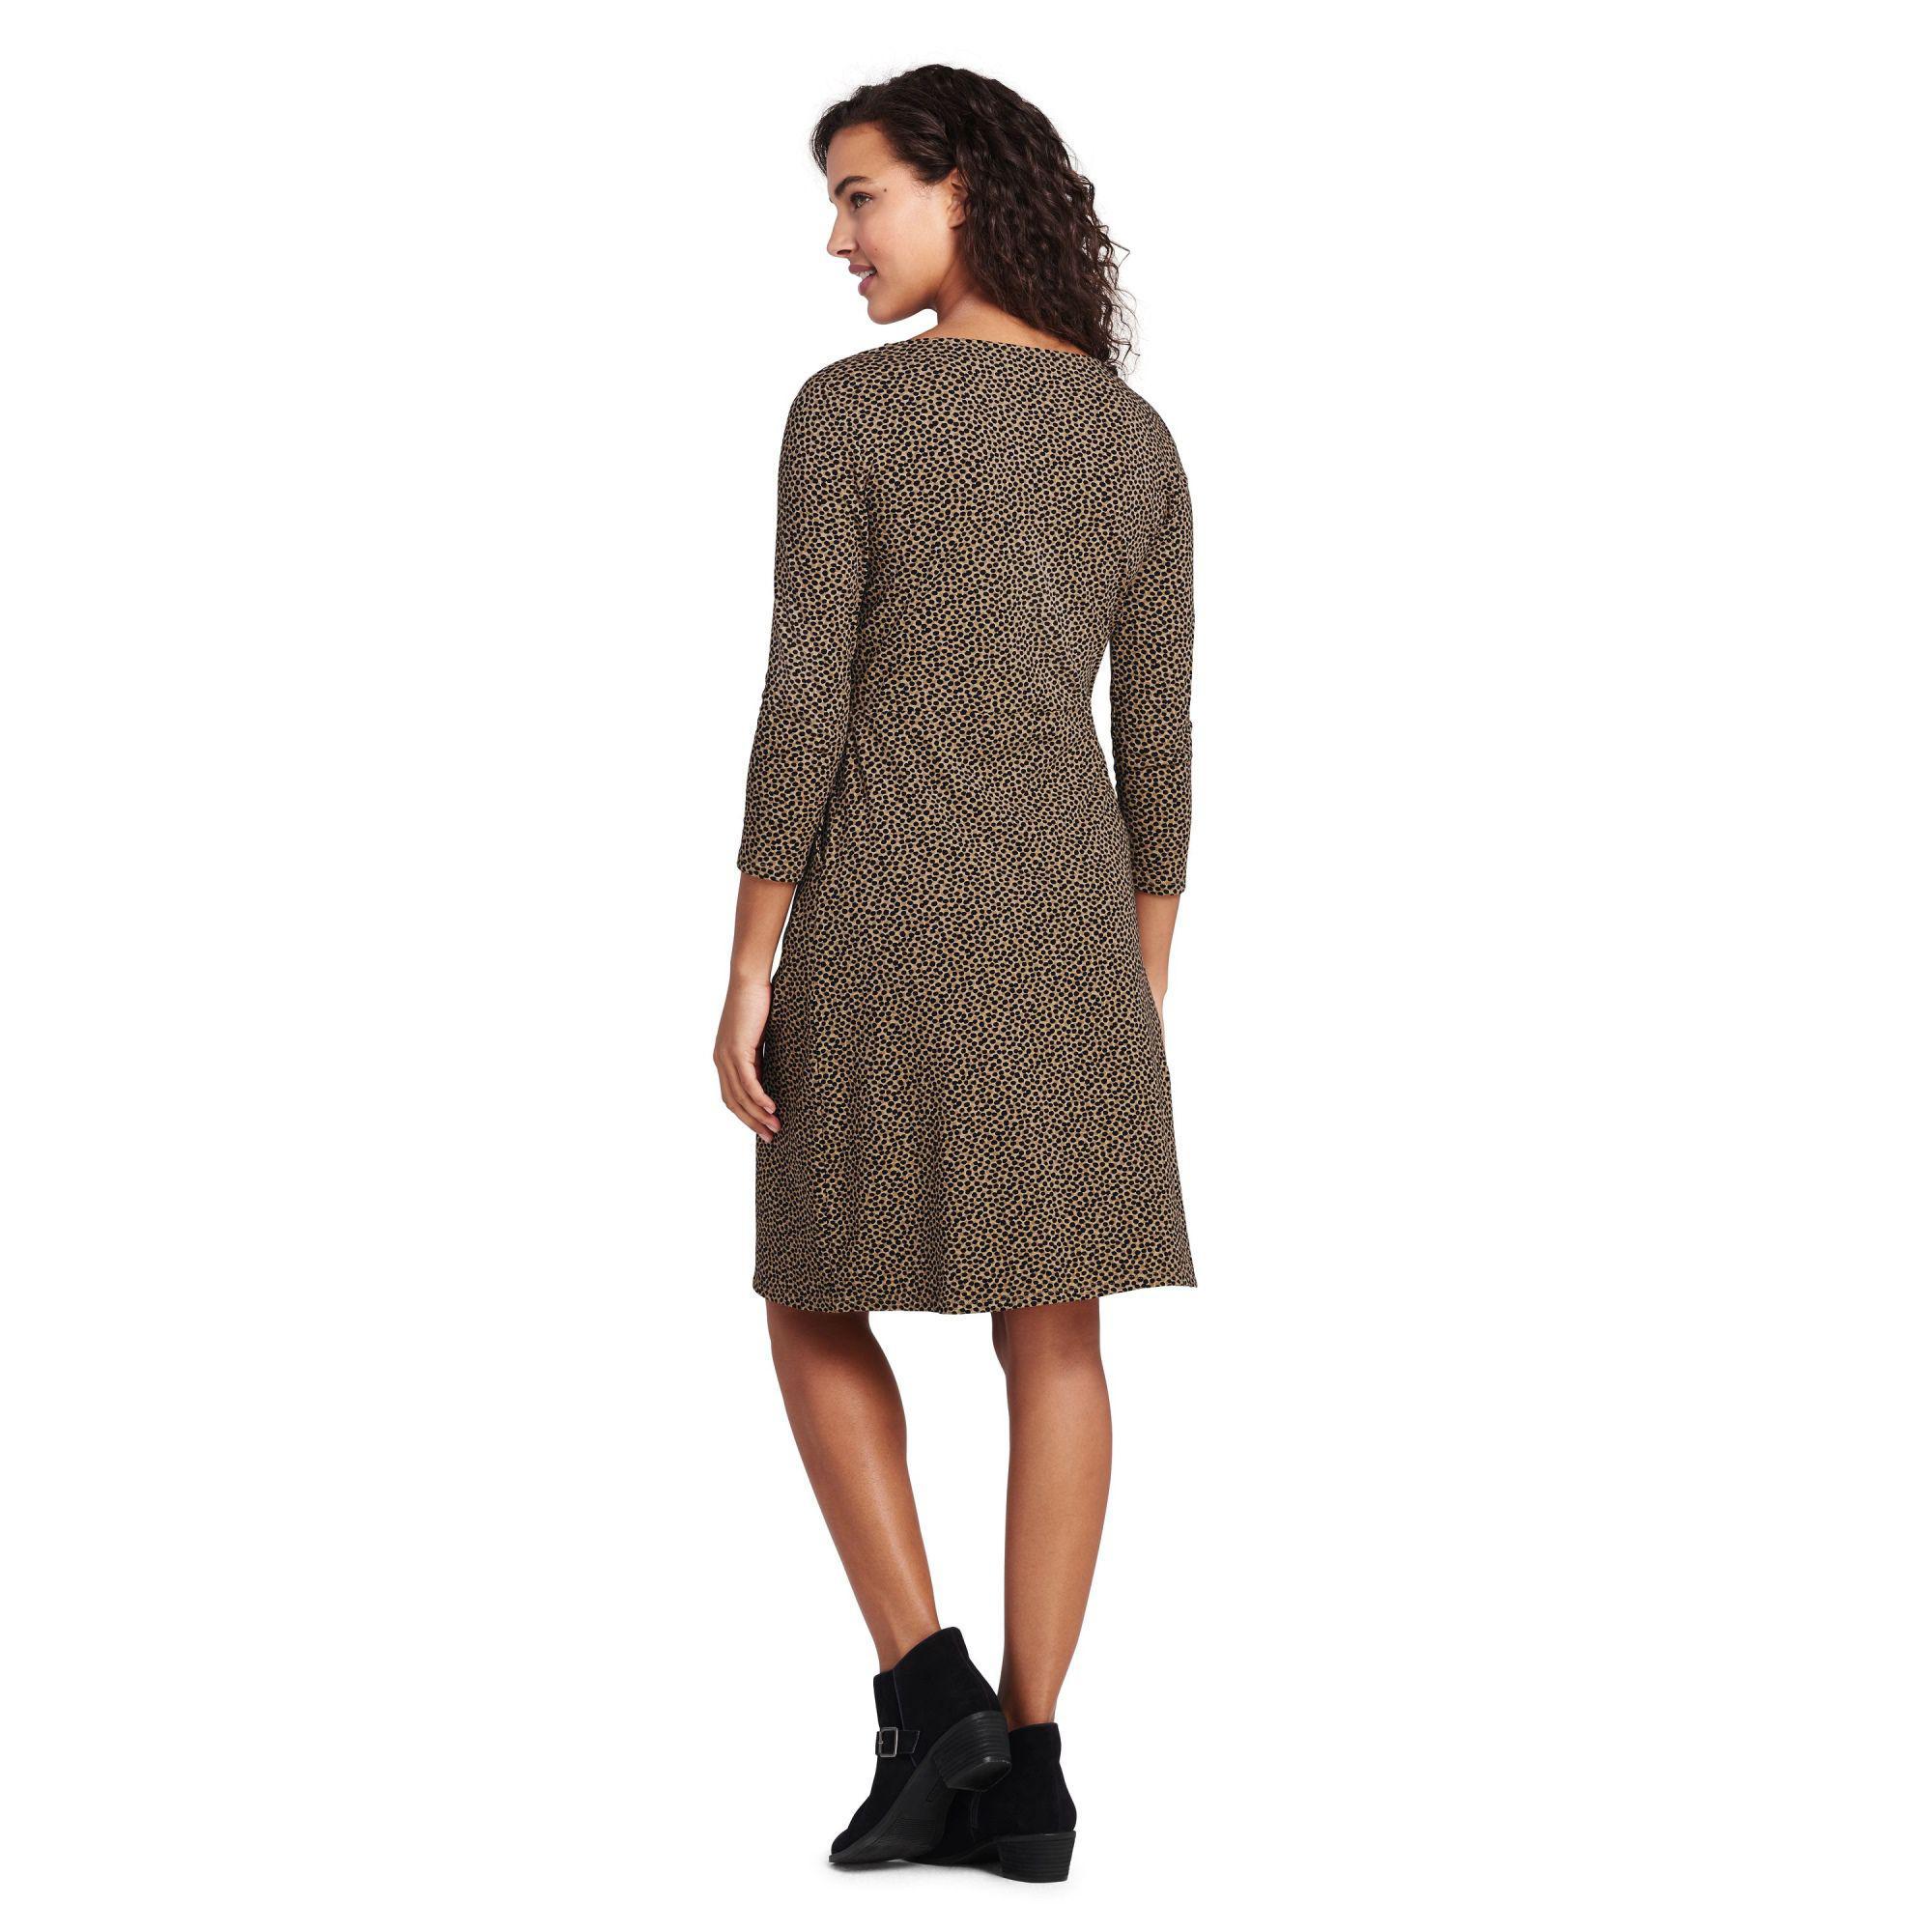 Lands End Womens Petite Cotton Jersey Sleeveless Swim Cover-up Dress Print